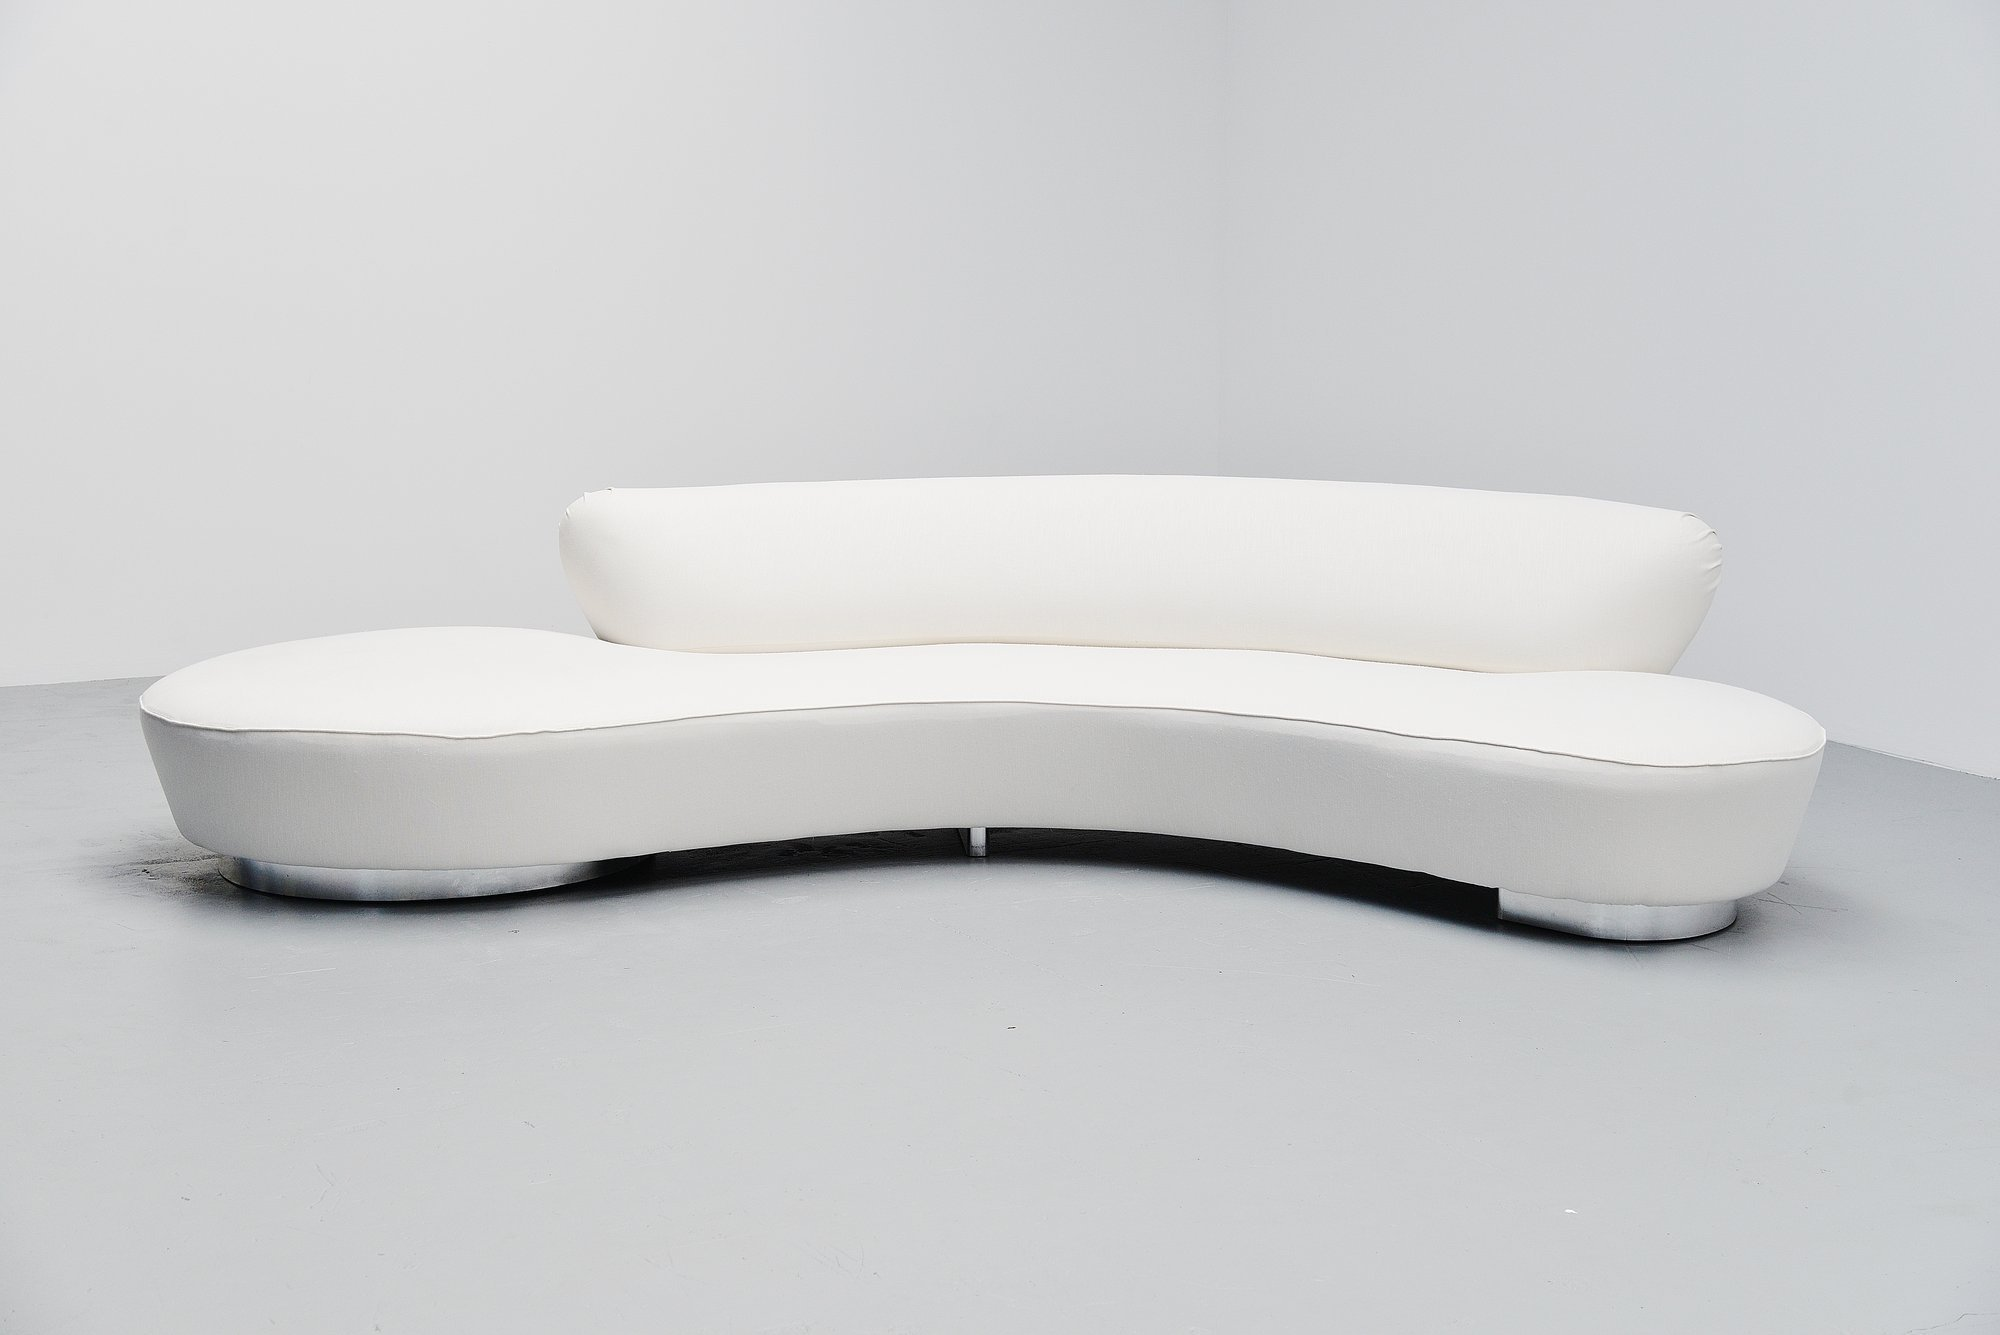 Vladimir Kagan Serpentine Sofa United States 1999